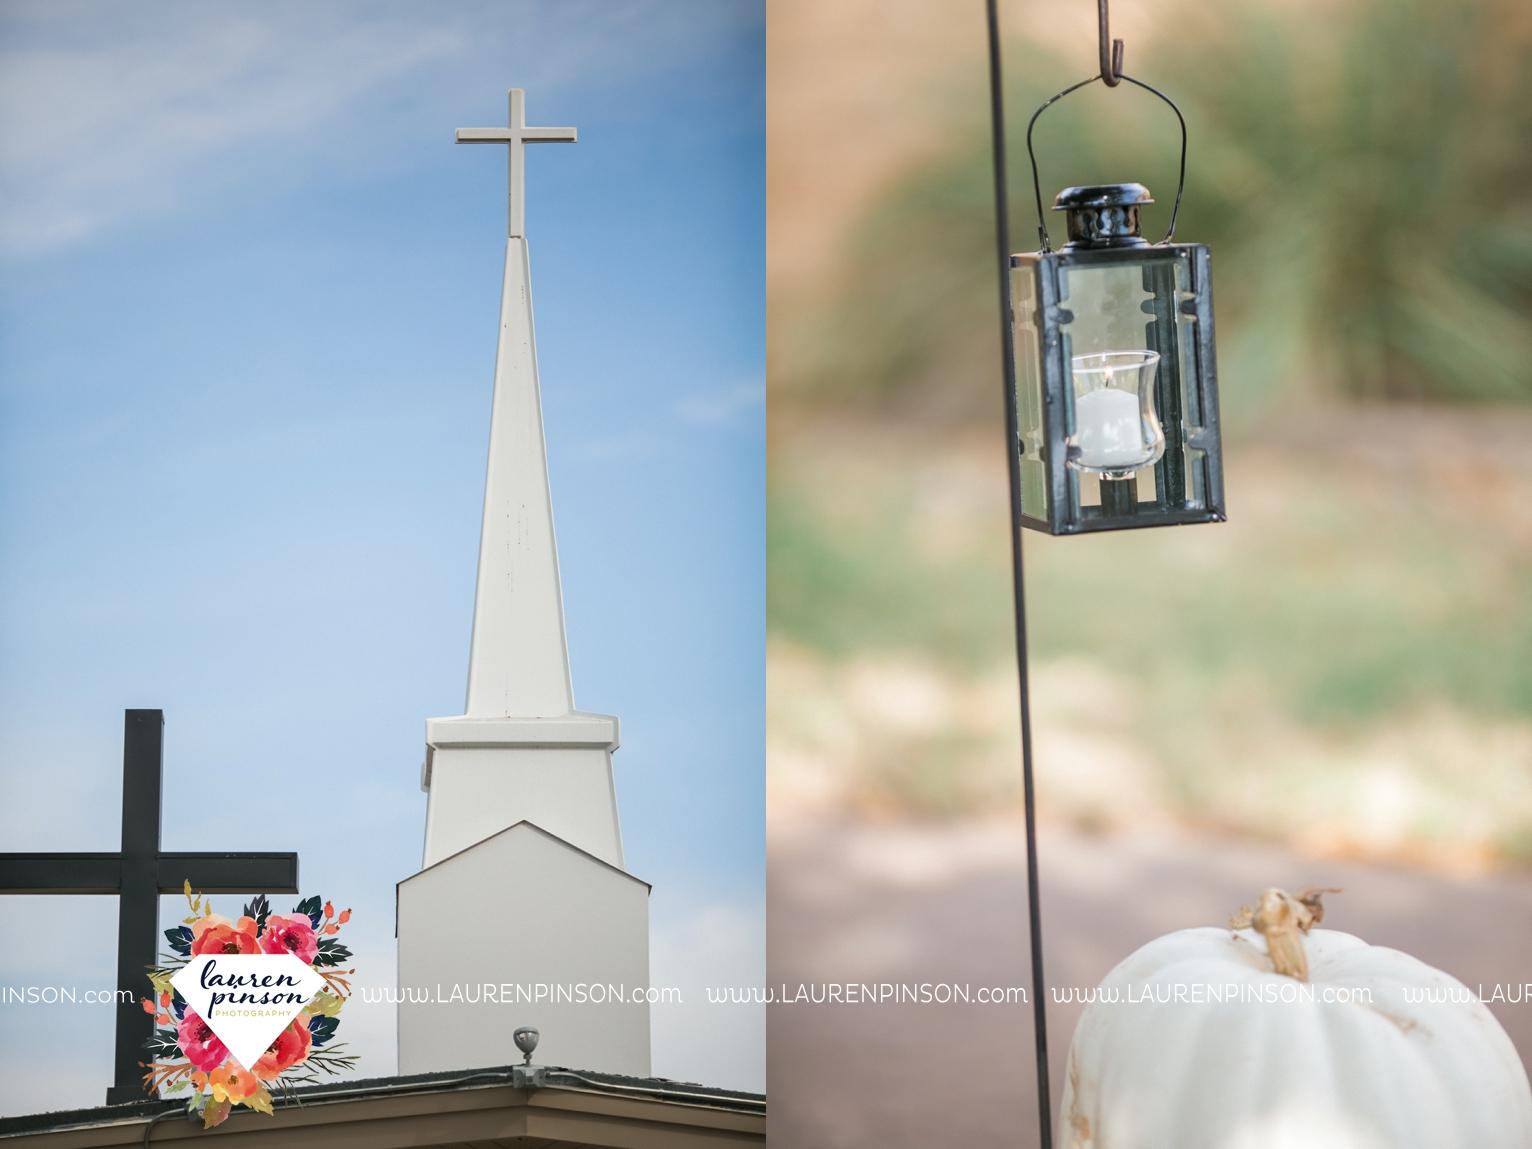 kemp-center-for-the-arts-wichita-falls-texas-wedding-photographer-fall-wedding-pumpkins-117.jpg